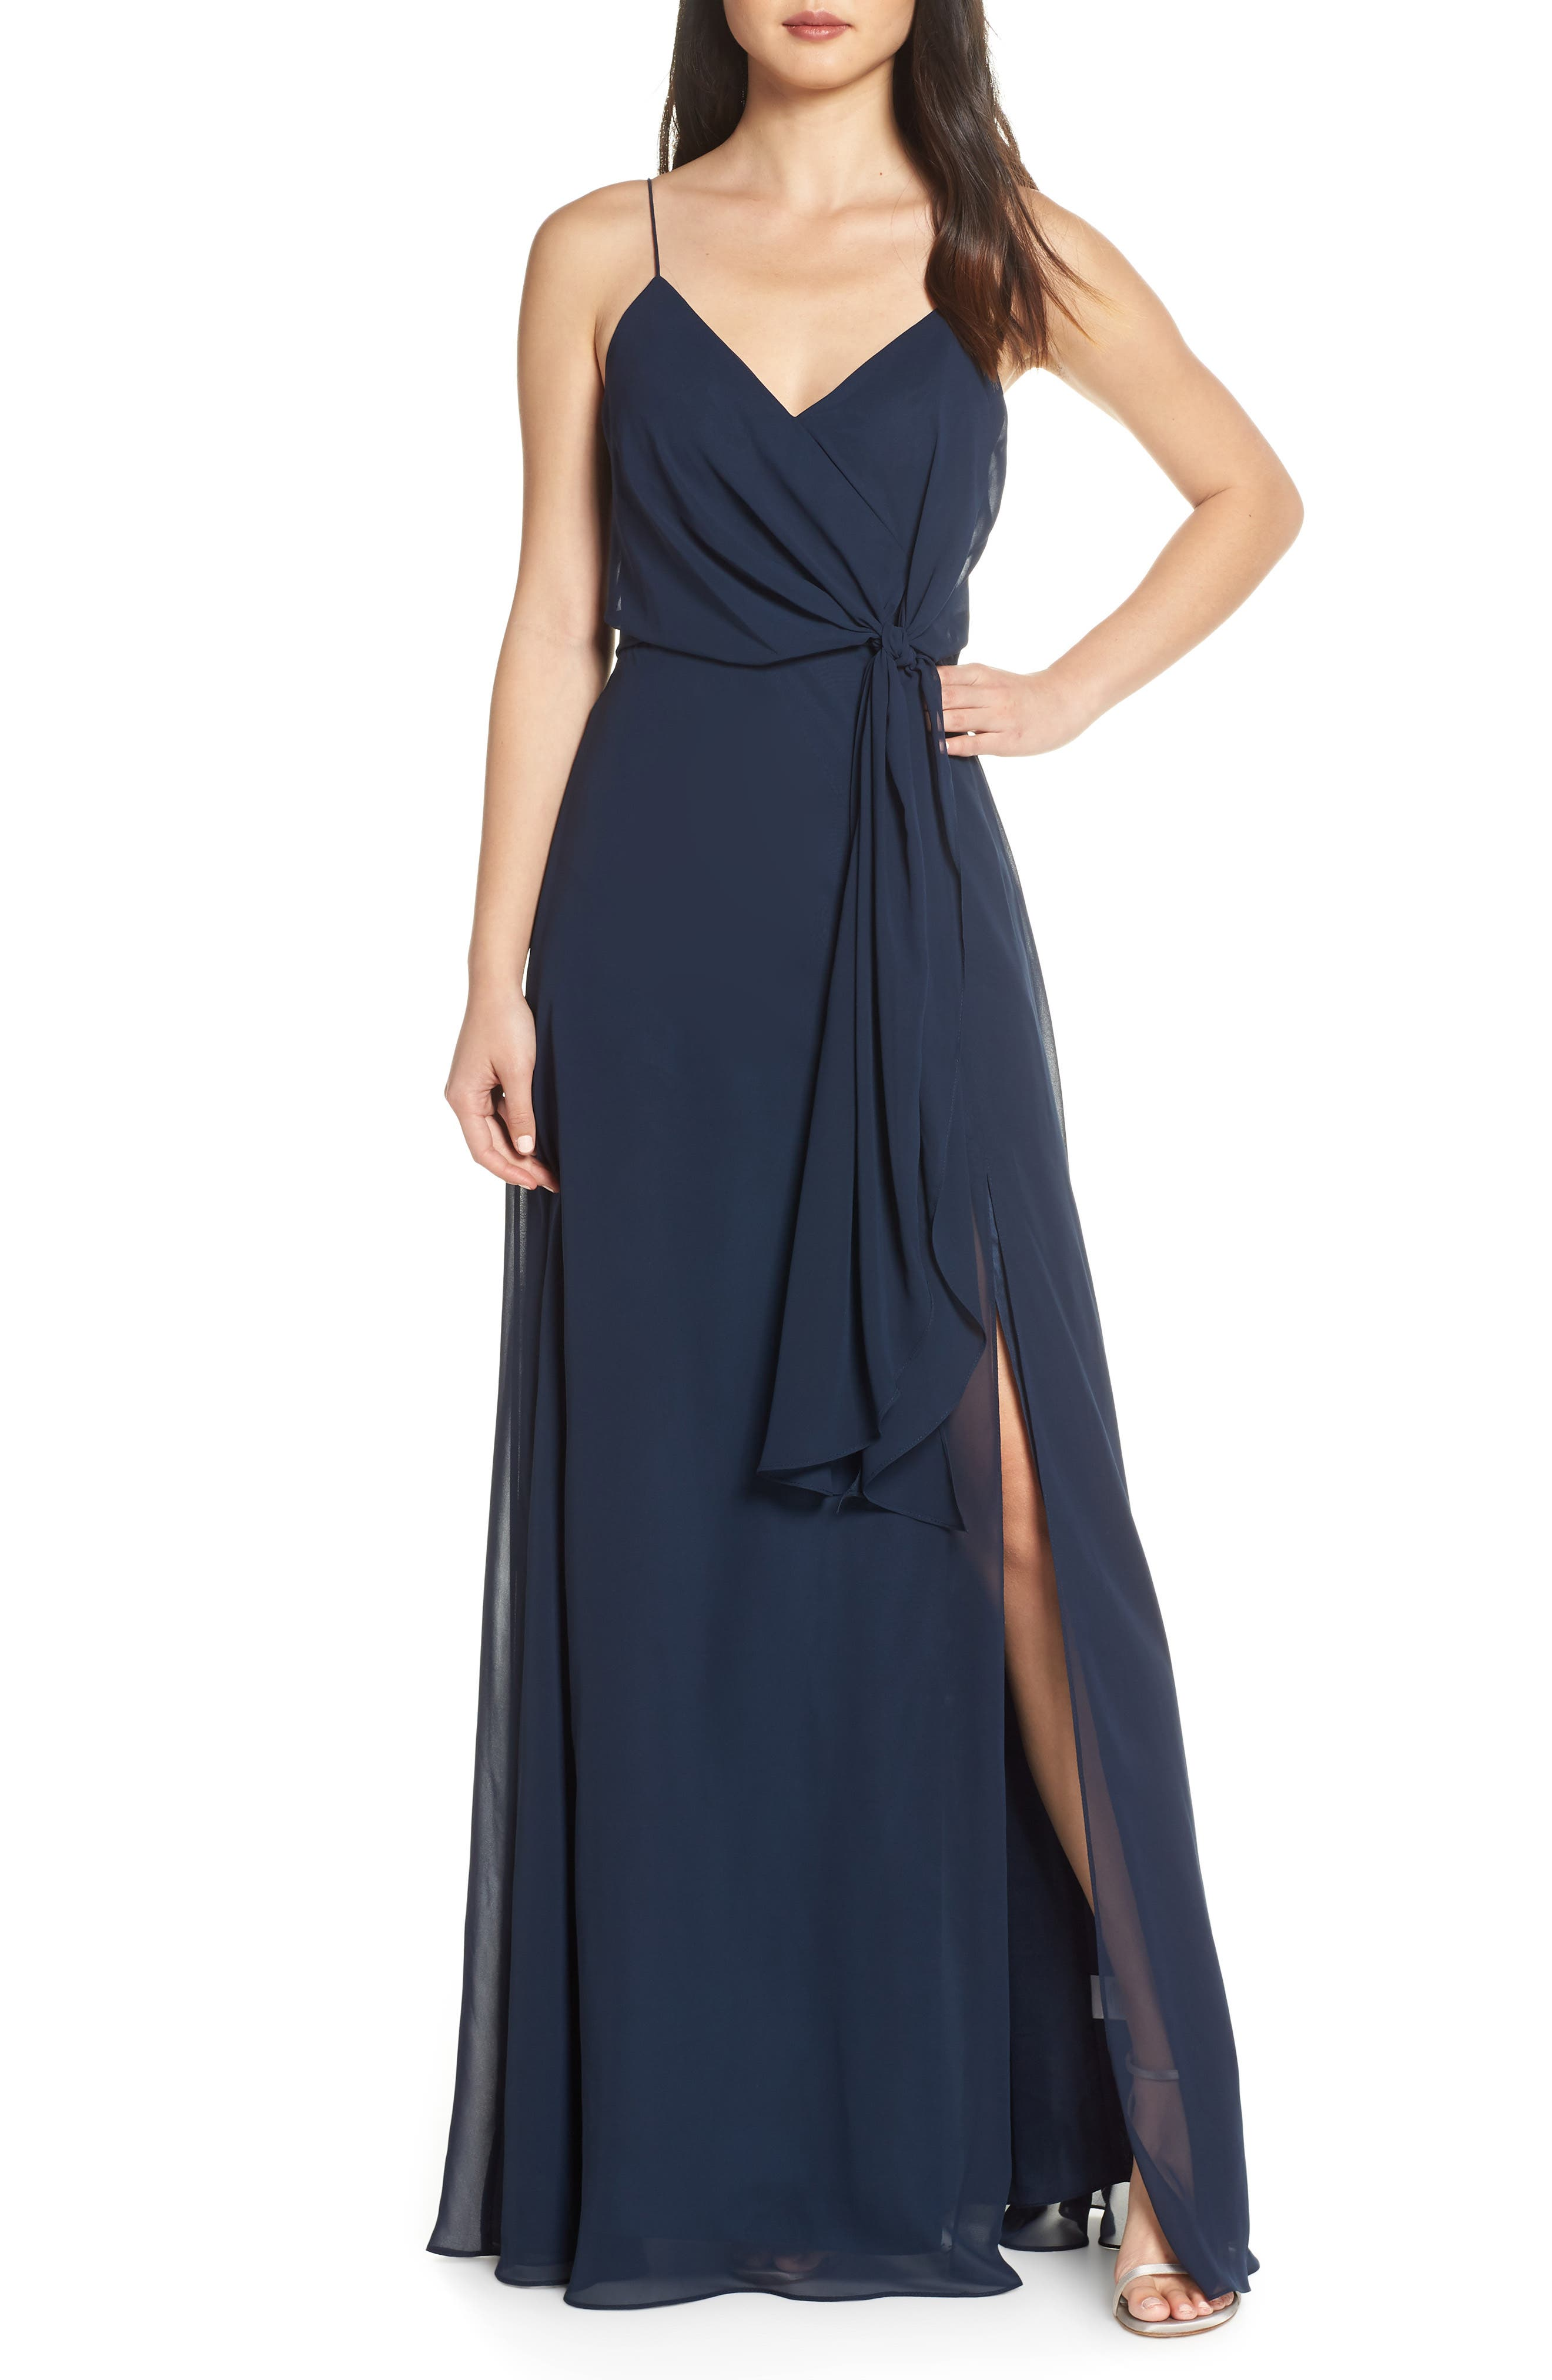 Jenny Yoo Amara Chiffon Overlay V-Neck Evening Dress, Blue